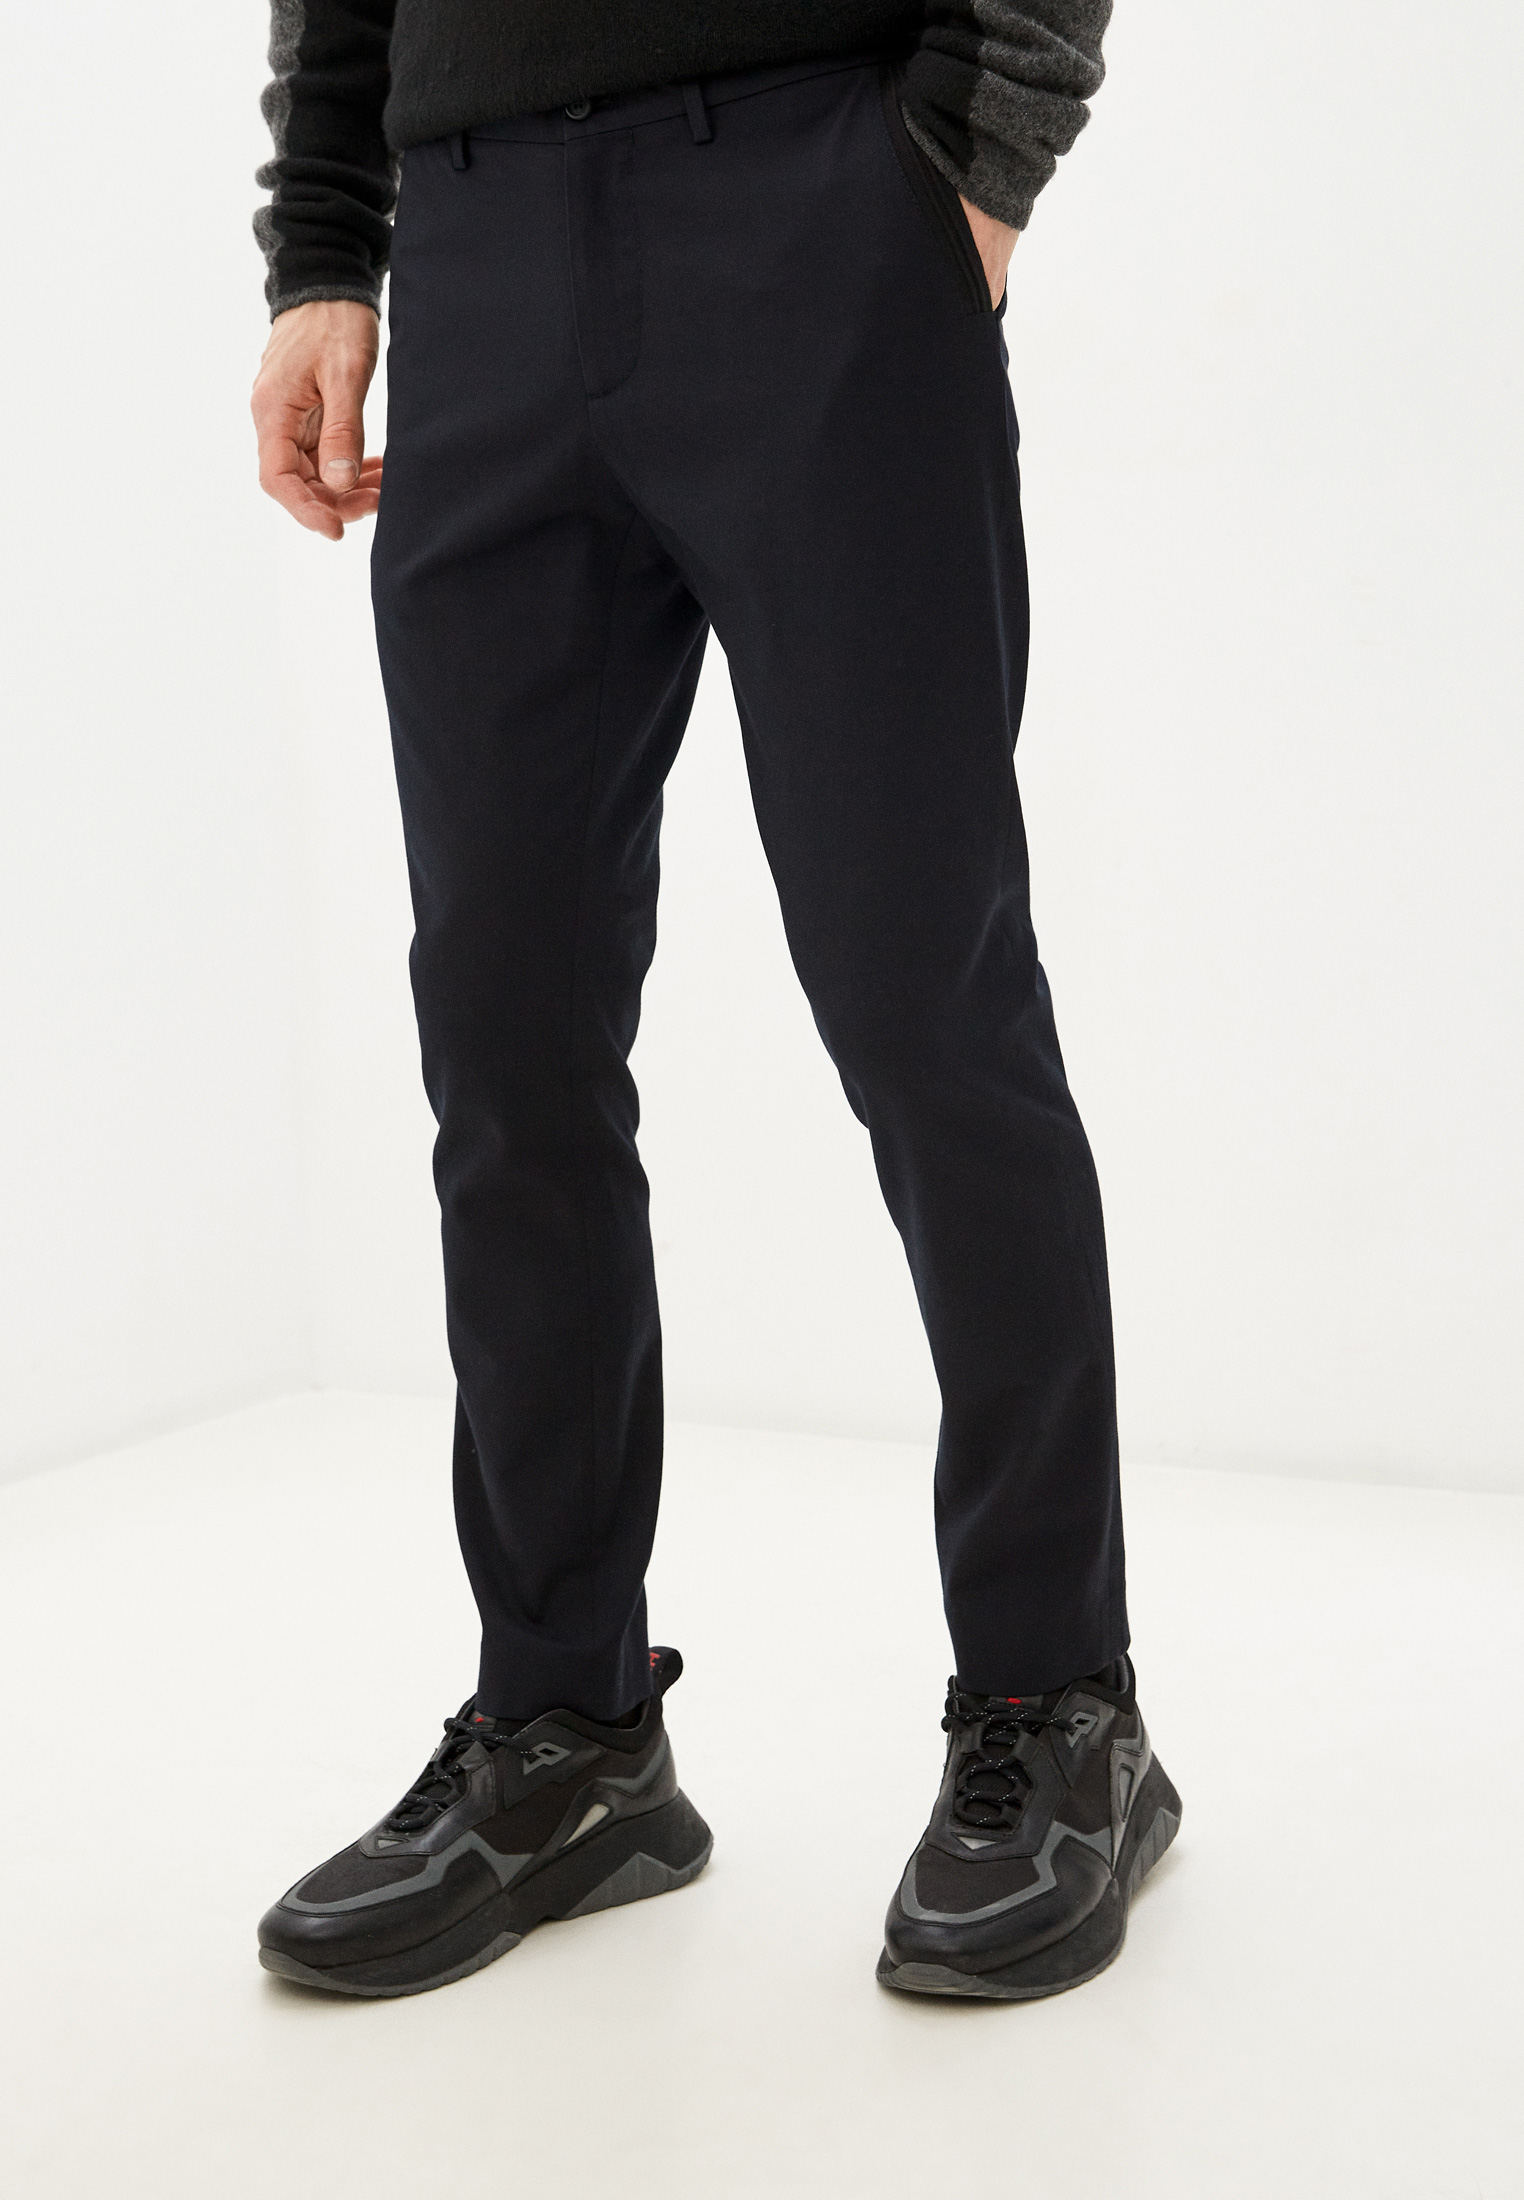 Мужские повседневные брюки Bikkembergs (Биккембергс) C P 008 00 S 2920